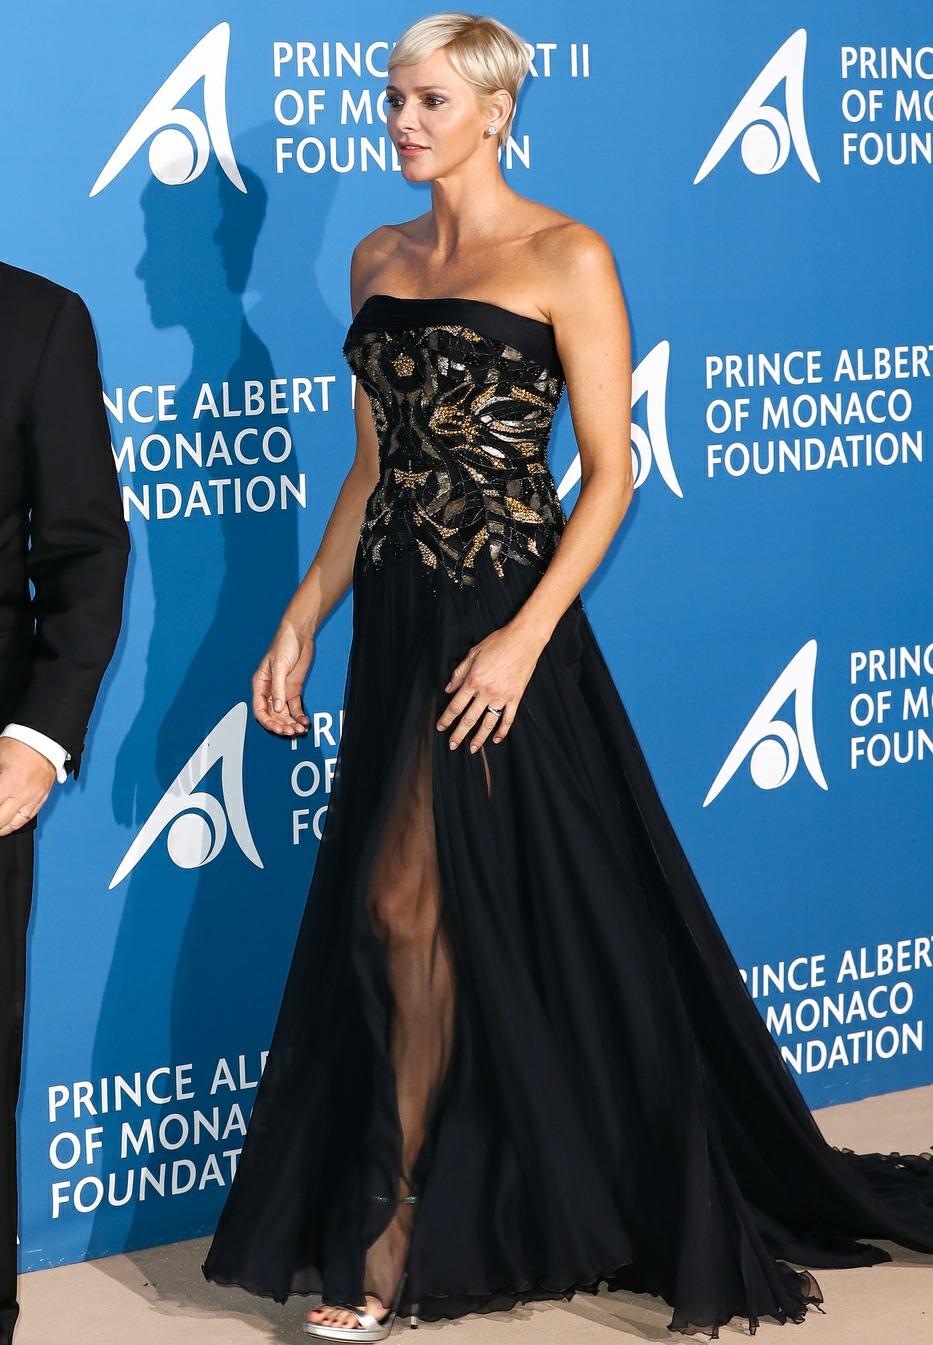 TT.SS.HH. Prince Albert II of Monaco and Princess Charlene of Monaco attend the Inaugural 'Monte-Carlo Gala For The Global Ocean' Honoring Leonardo DiCaprio at The Monaco Garnier Opera on September 28, 2017 in Monaco, Monaco.USA, OZ, NZ, SOUTH AFRICA, JAPA